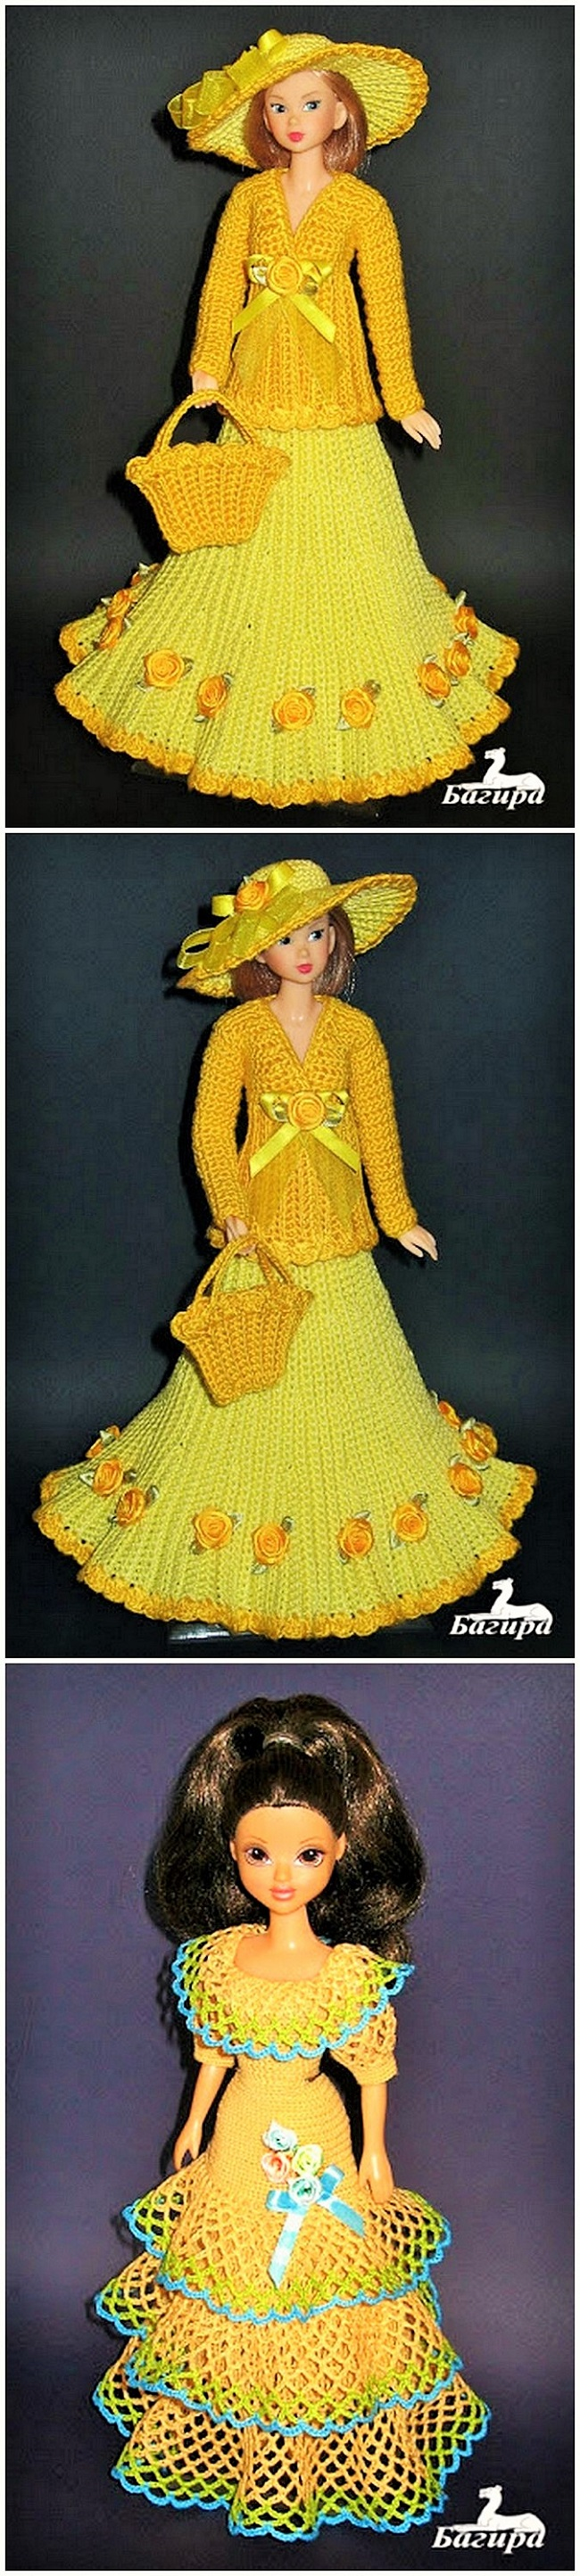 Home made Diy crochet Ideas-3